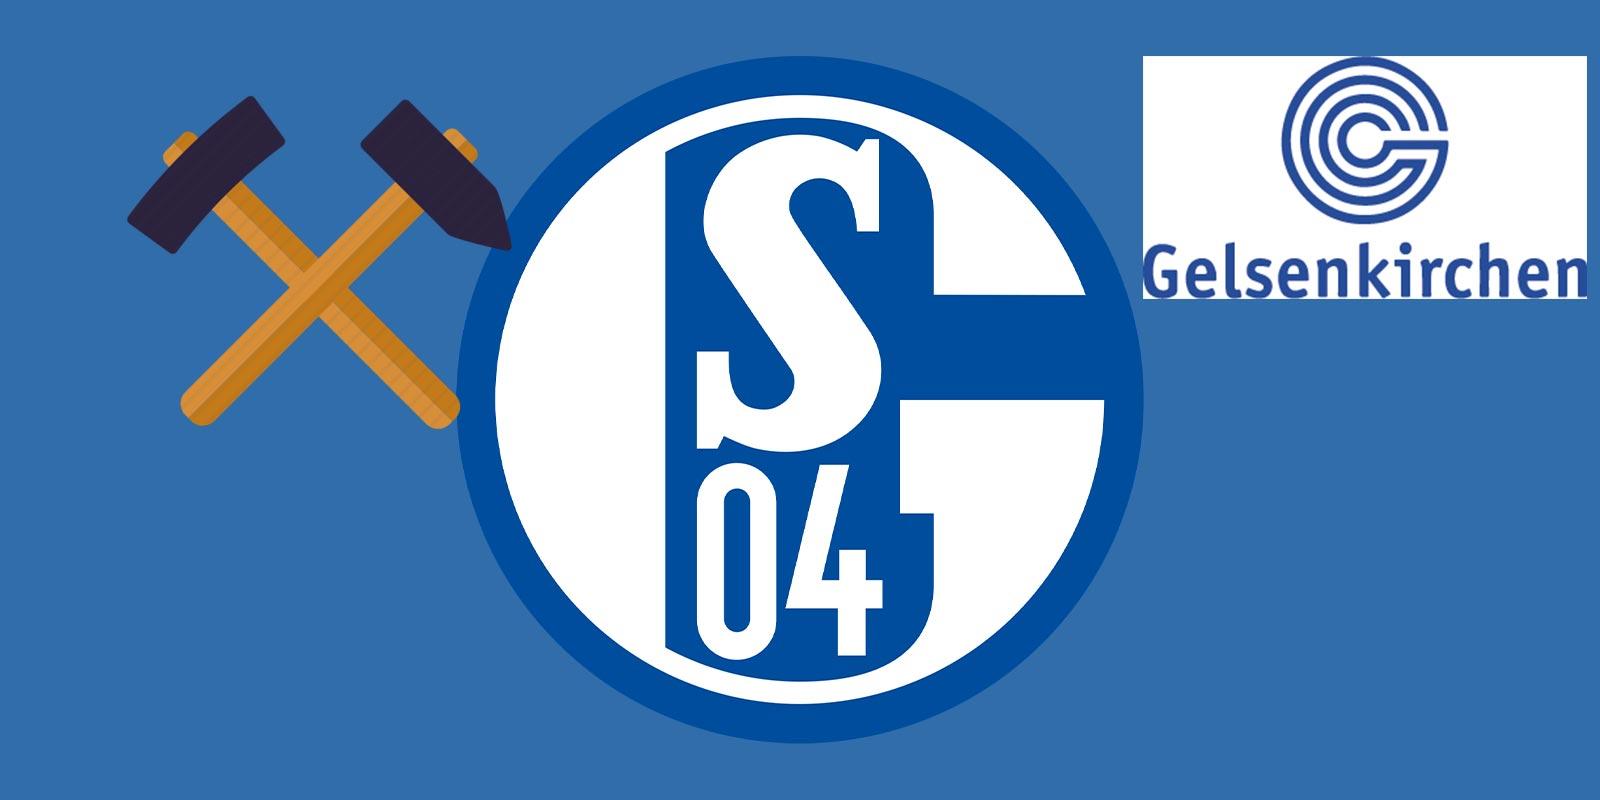 Fc schalke 04 logo clipart vector black and white Schalke 04 Logo Features Two Hidden Elements - Footy Headlines vector black and white